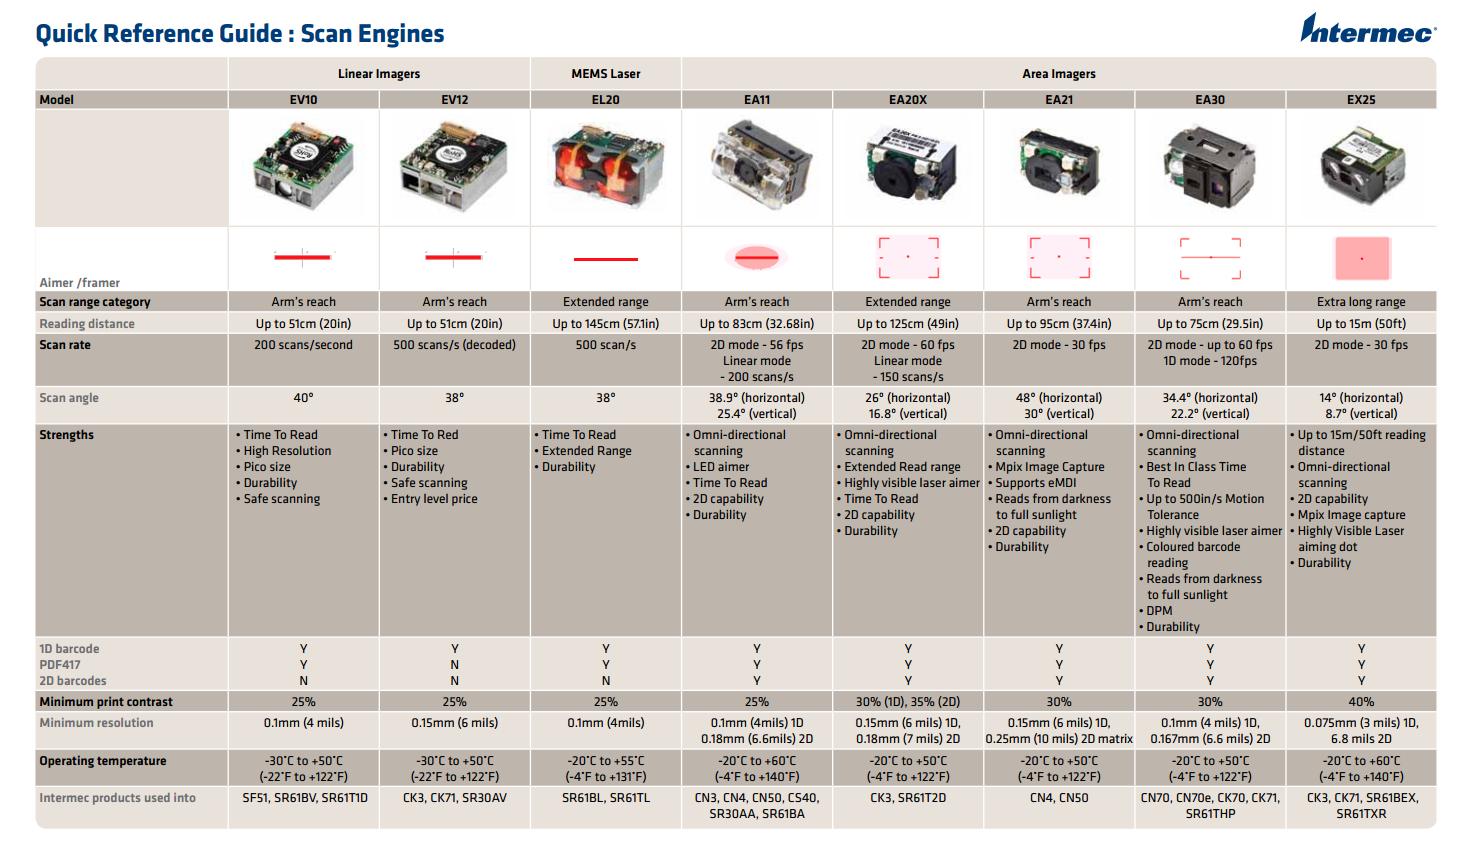 Intermec Scan Engine Guide